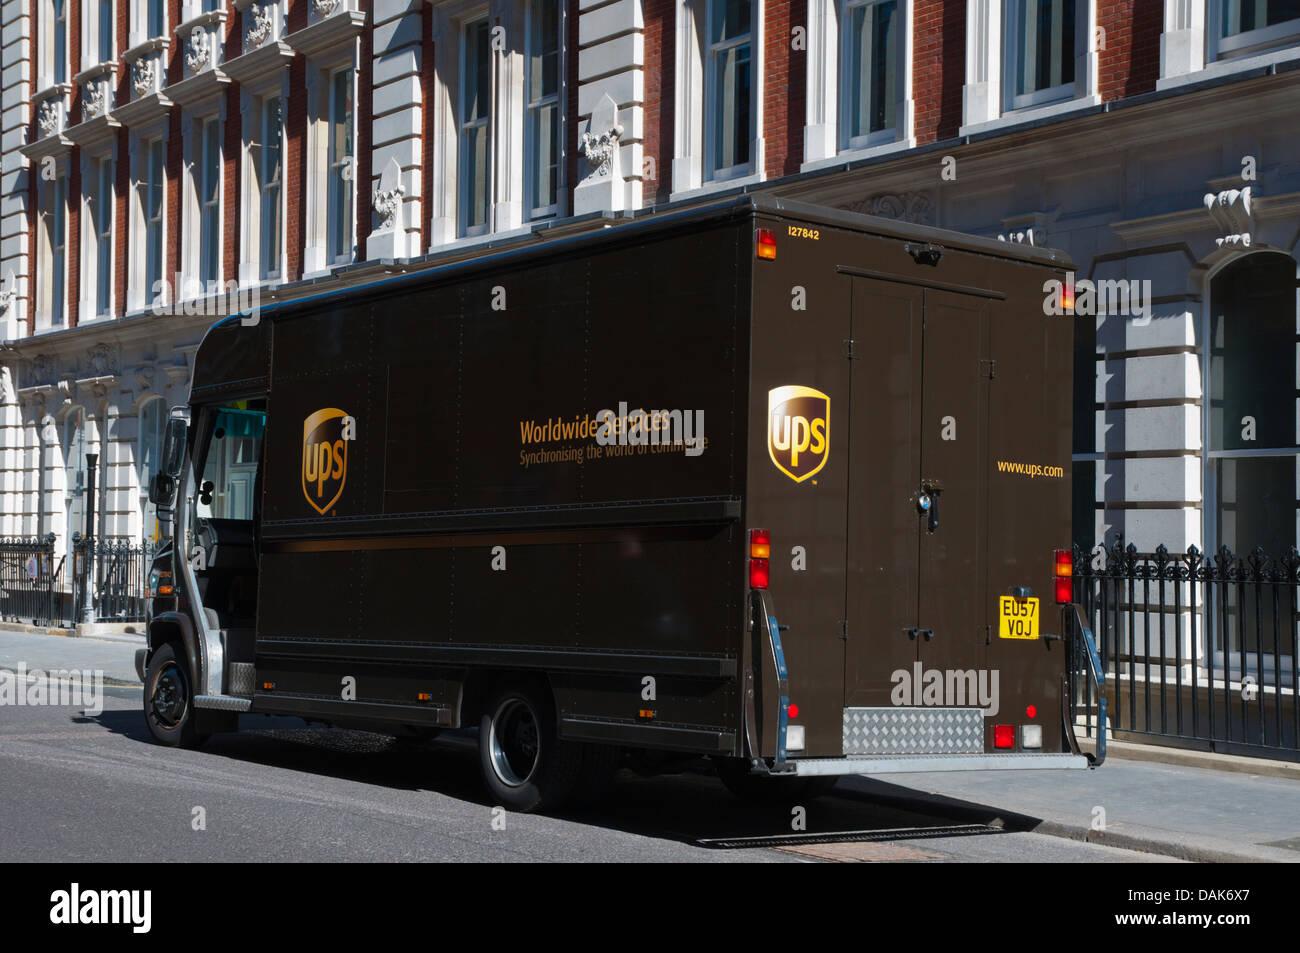 Livraison UPS colis postal véhicule de service central district Fitzrovia London England Angleterre UK Europe Photo Stock